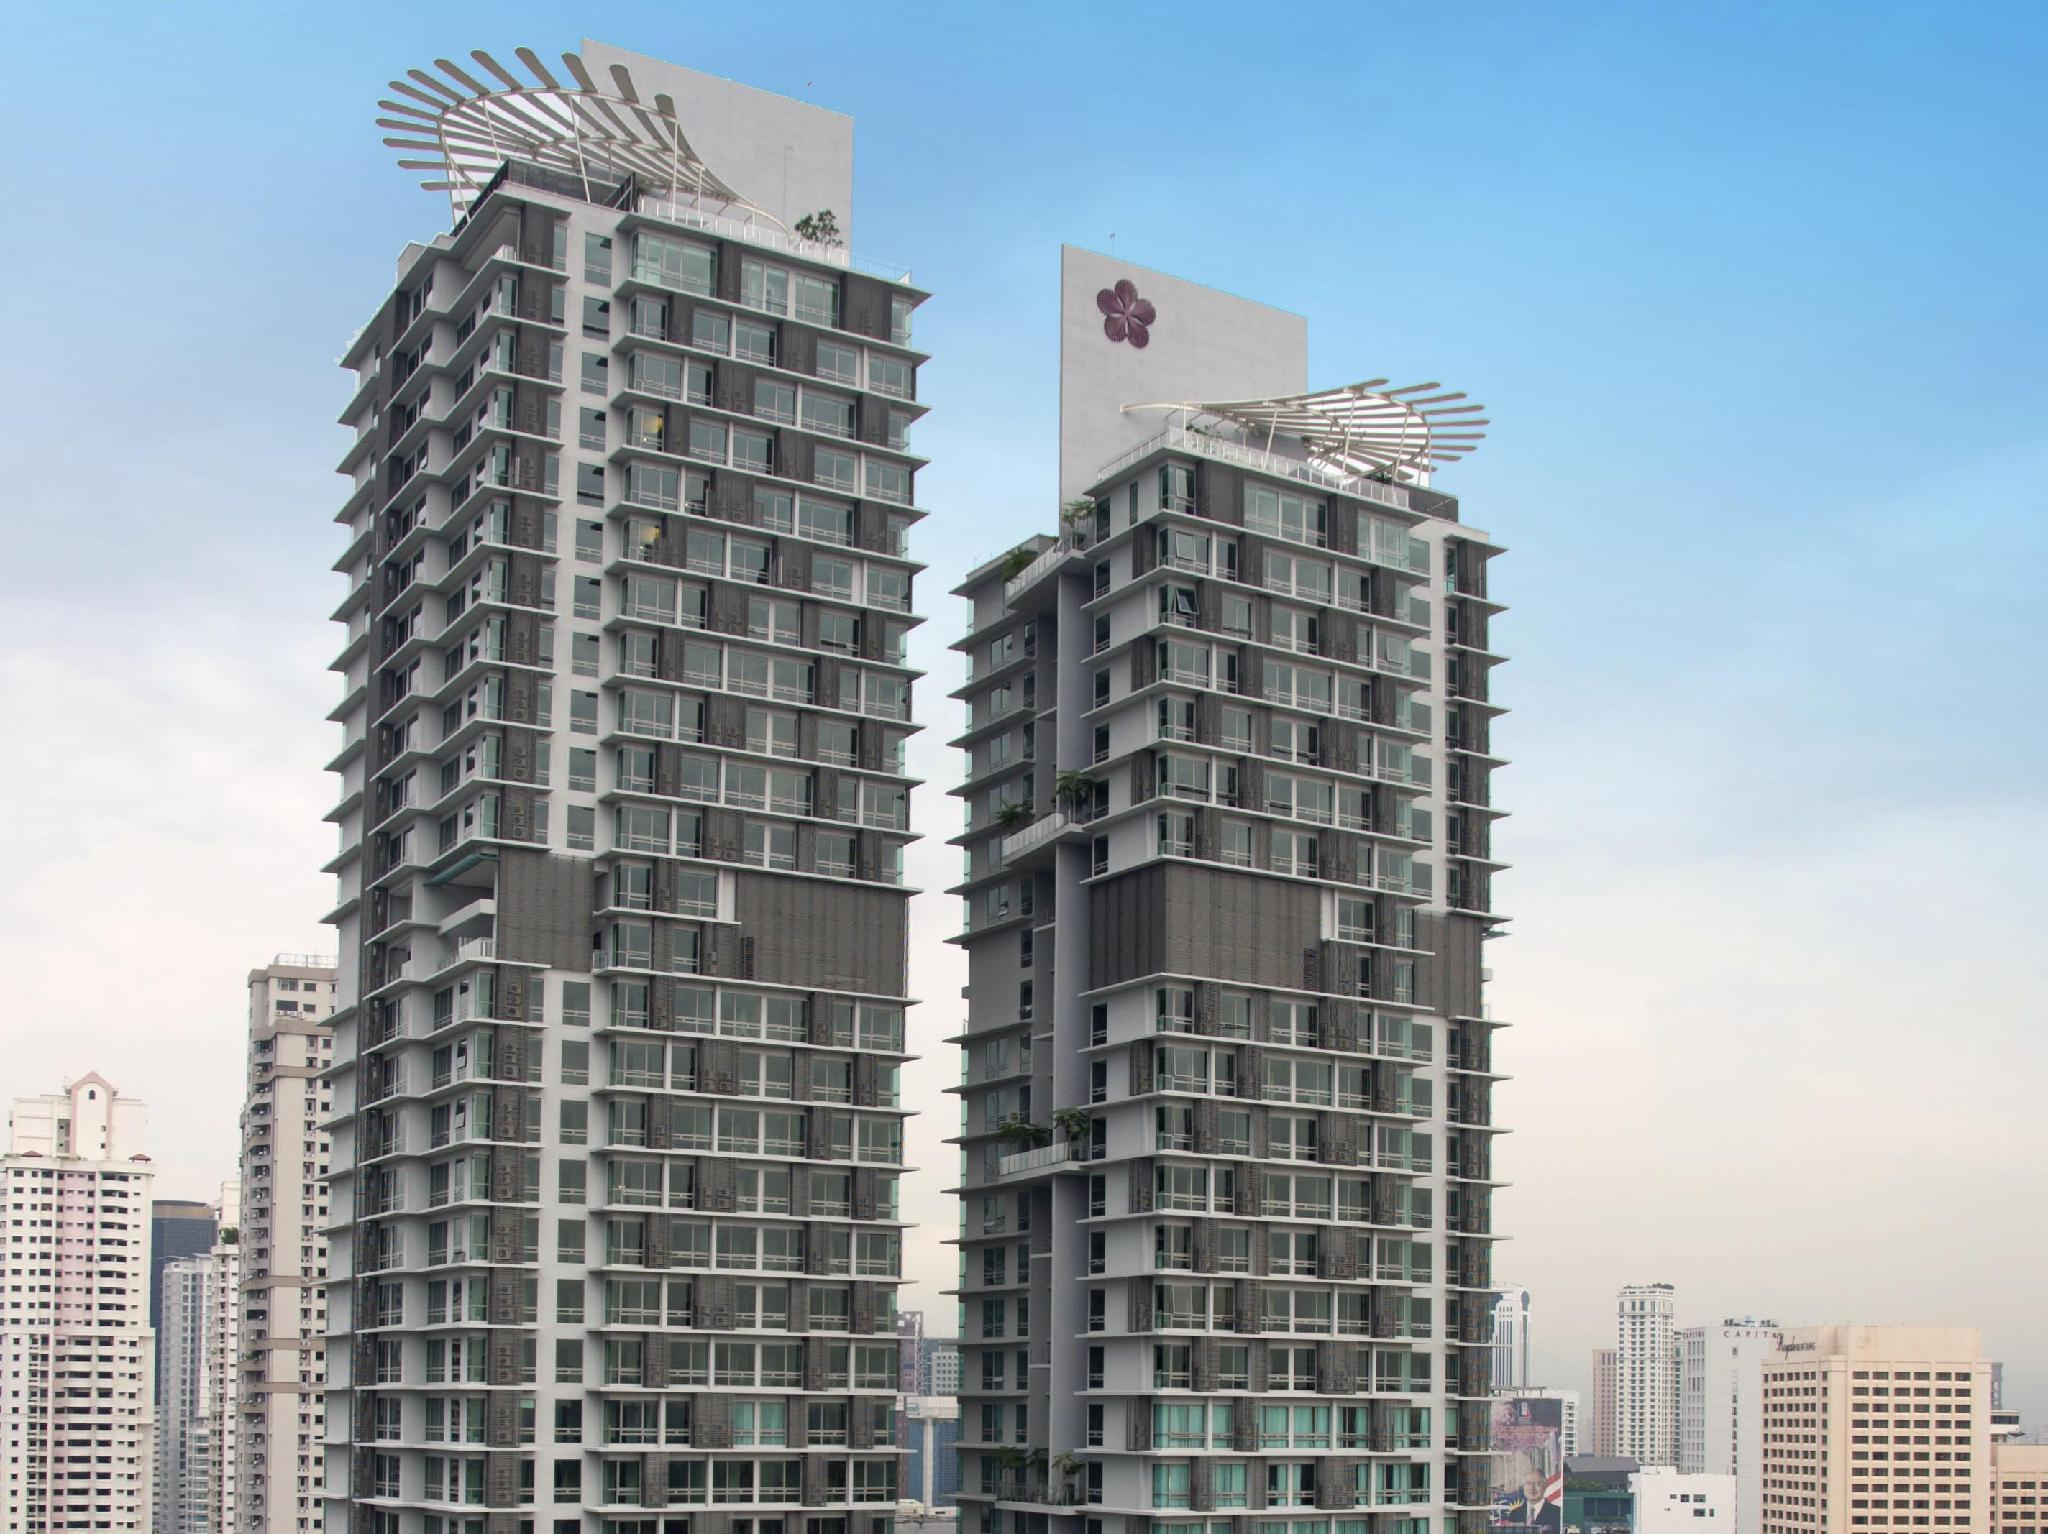 Swiss-Garden Residences Bukit Bintang Kuala Lumpur - Hotels and Accommodation in Malaysia, Asia